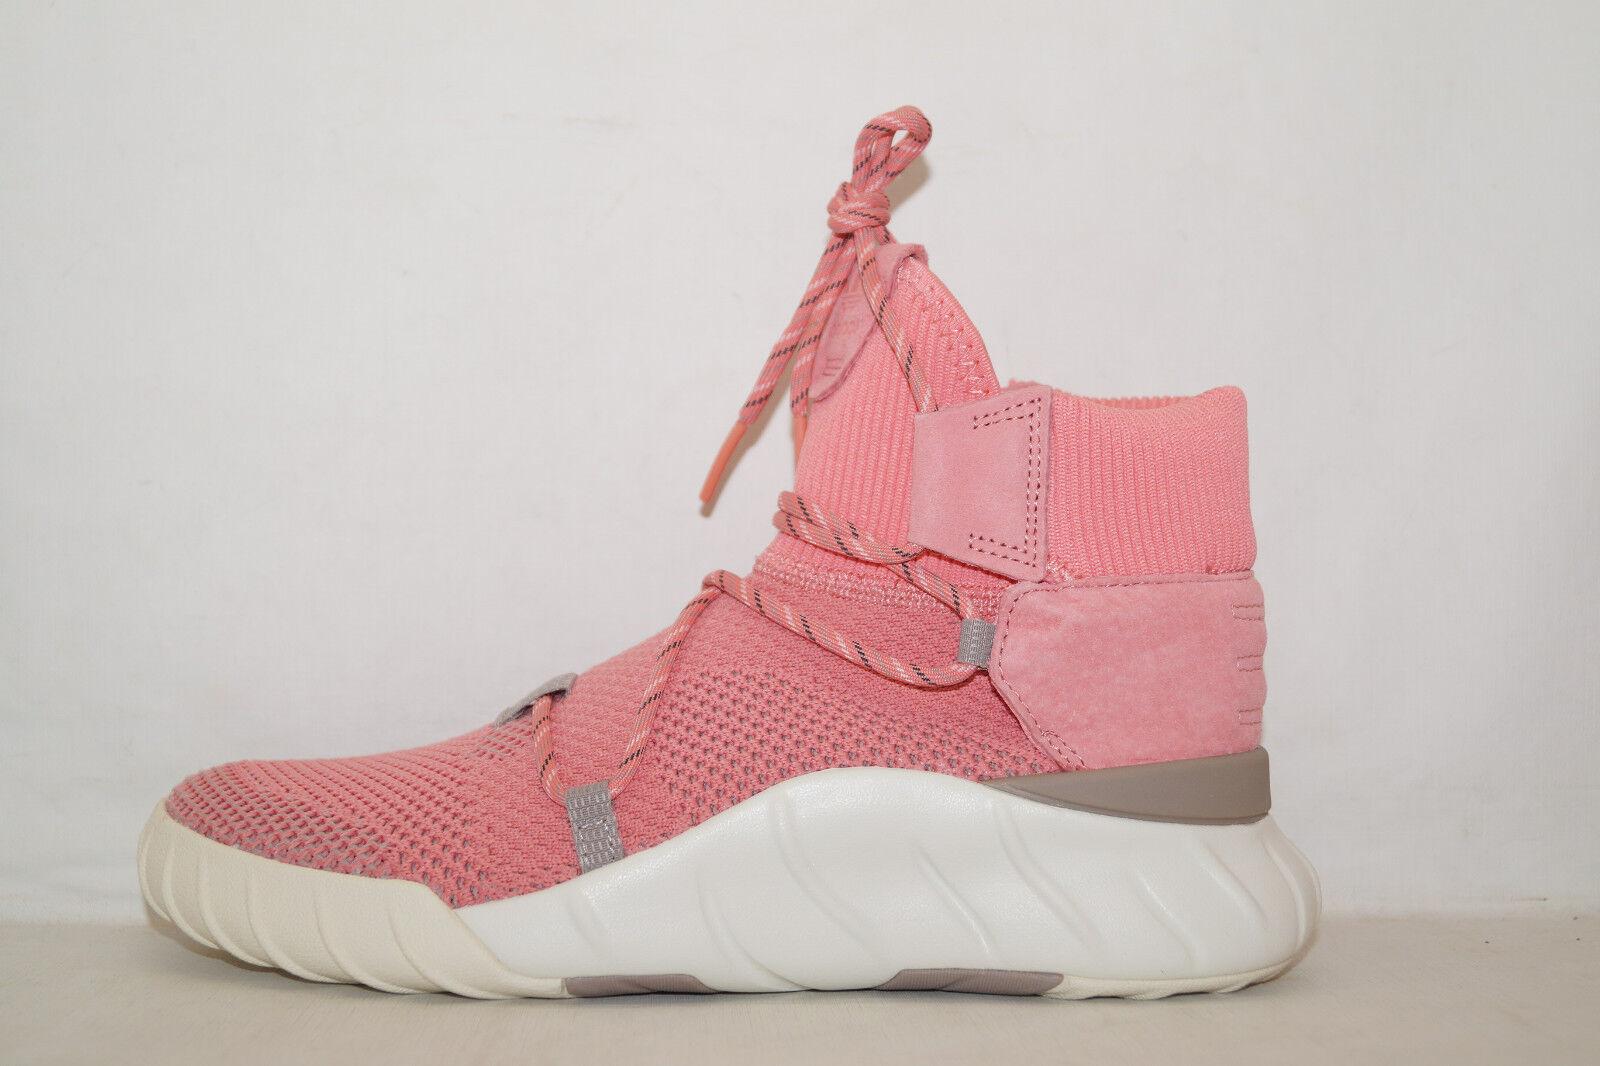 adidas originals X TUBULAR X originals 2.0 PK PRIMEKNIT W EU 40.6  UK 7 rosa altweiß BY2124 775322